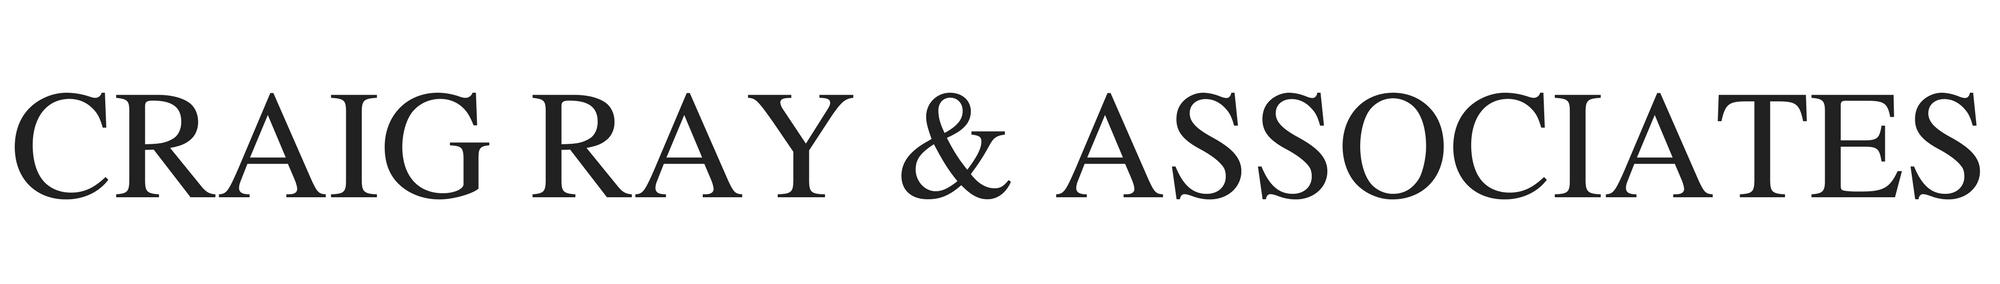 Craig Ray & Associates